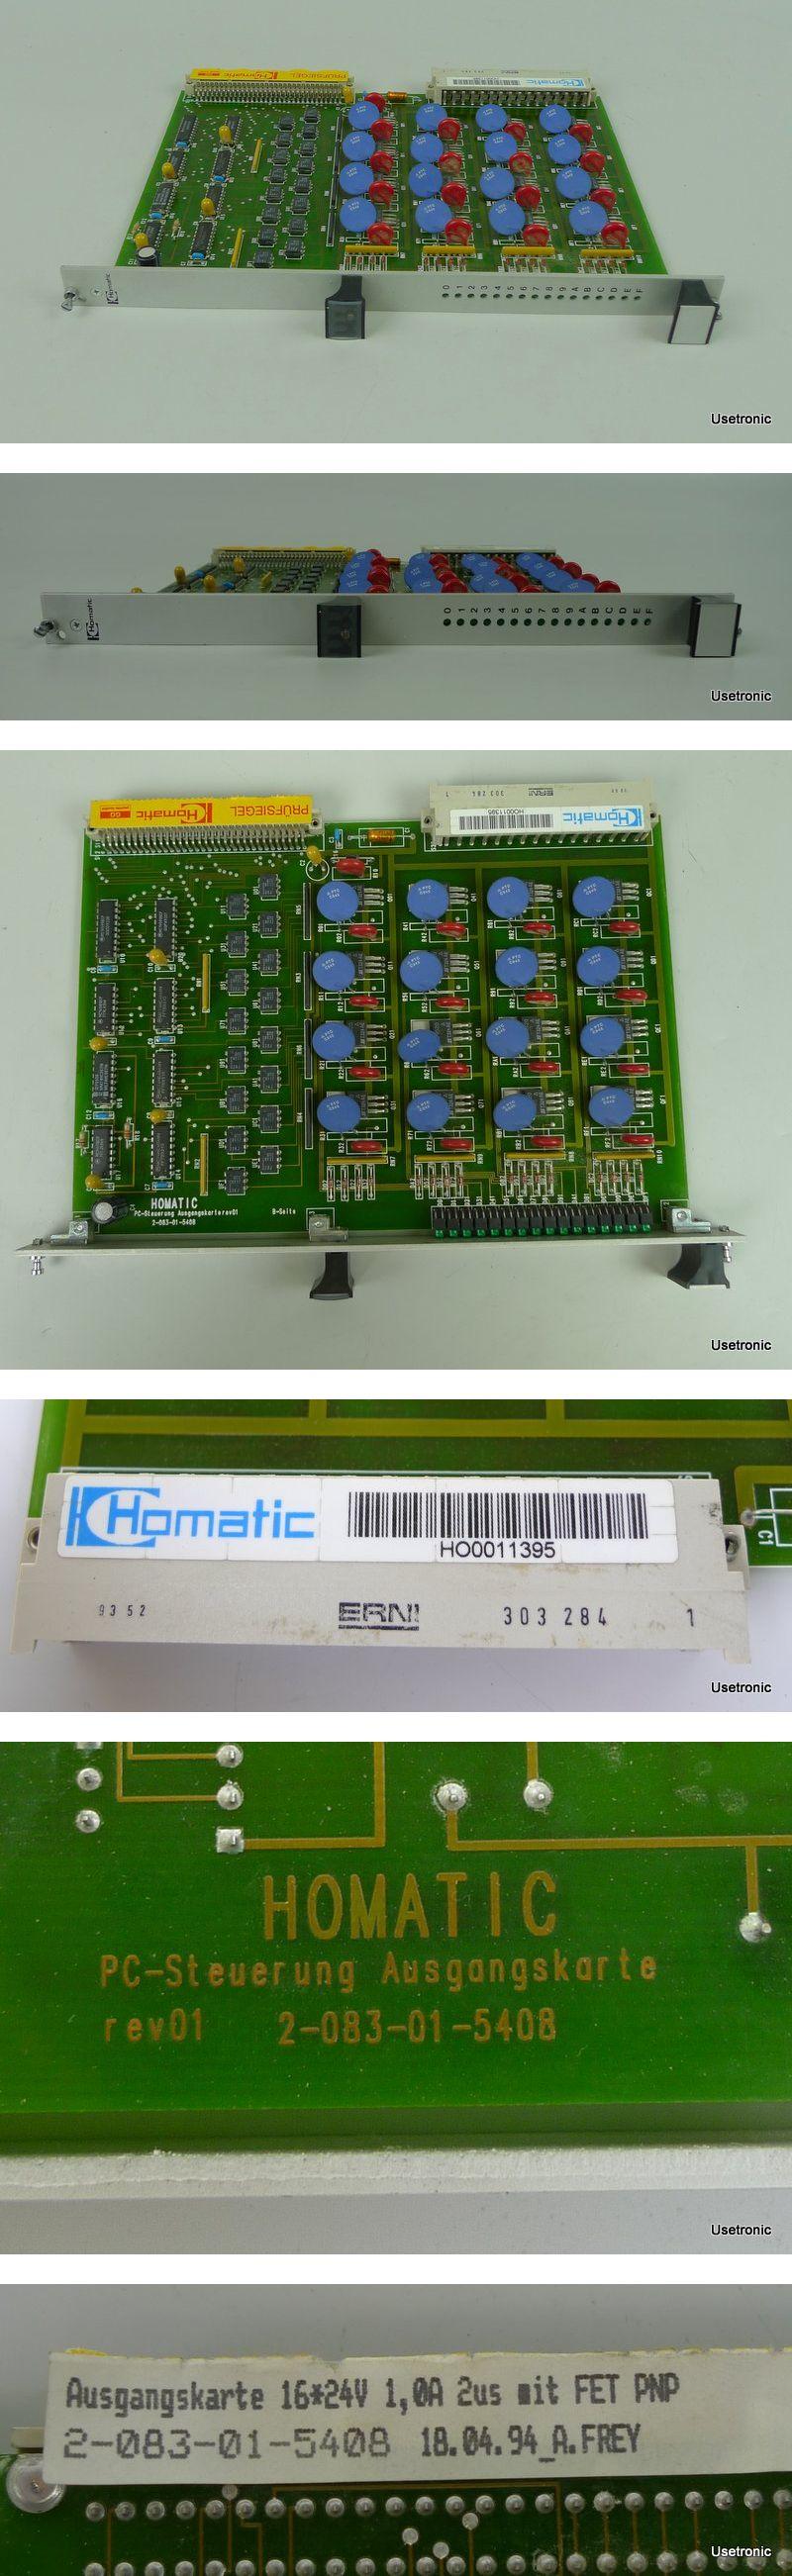 Homatic 2-083-01-5408